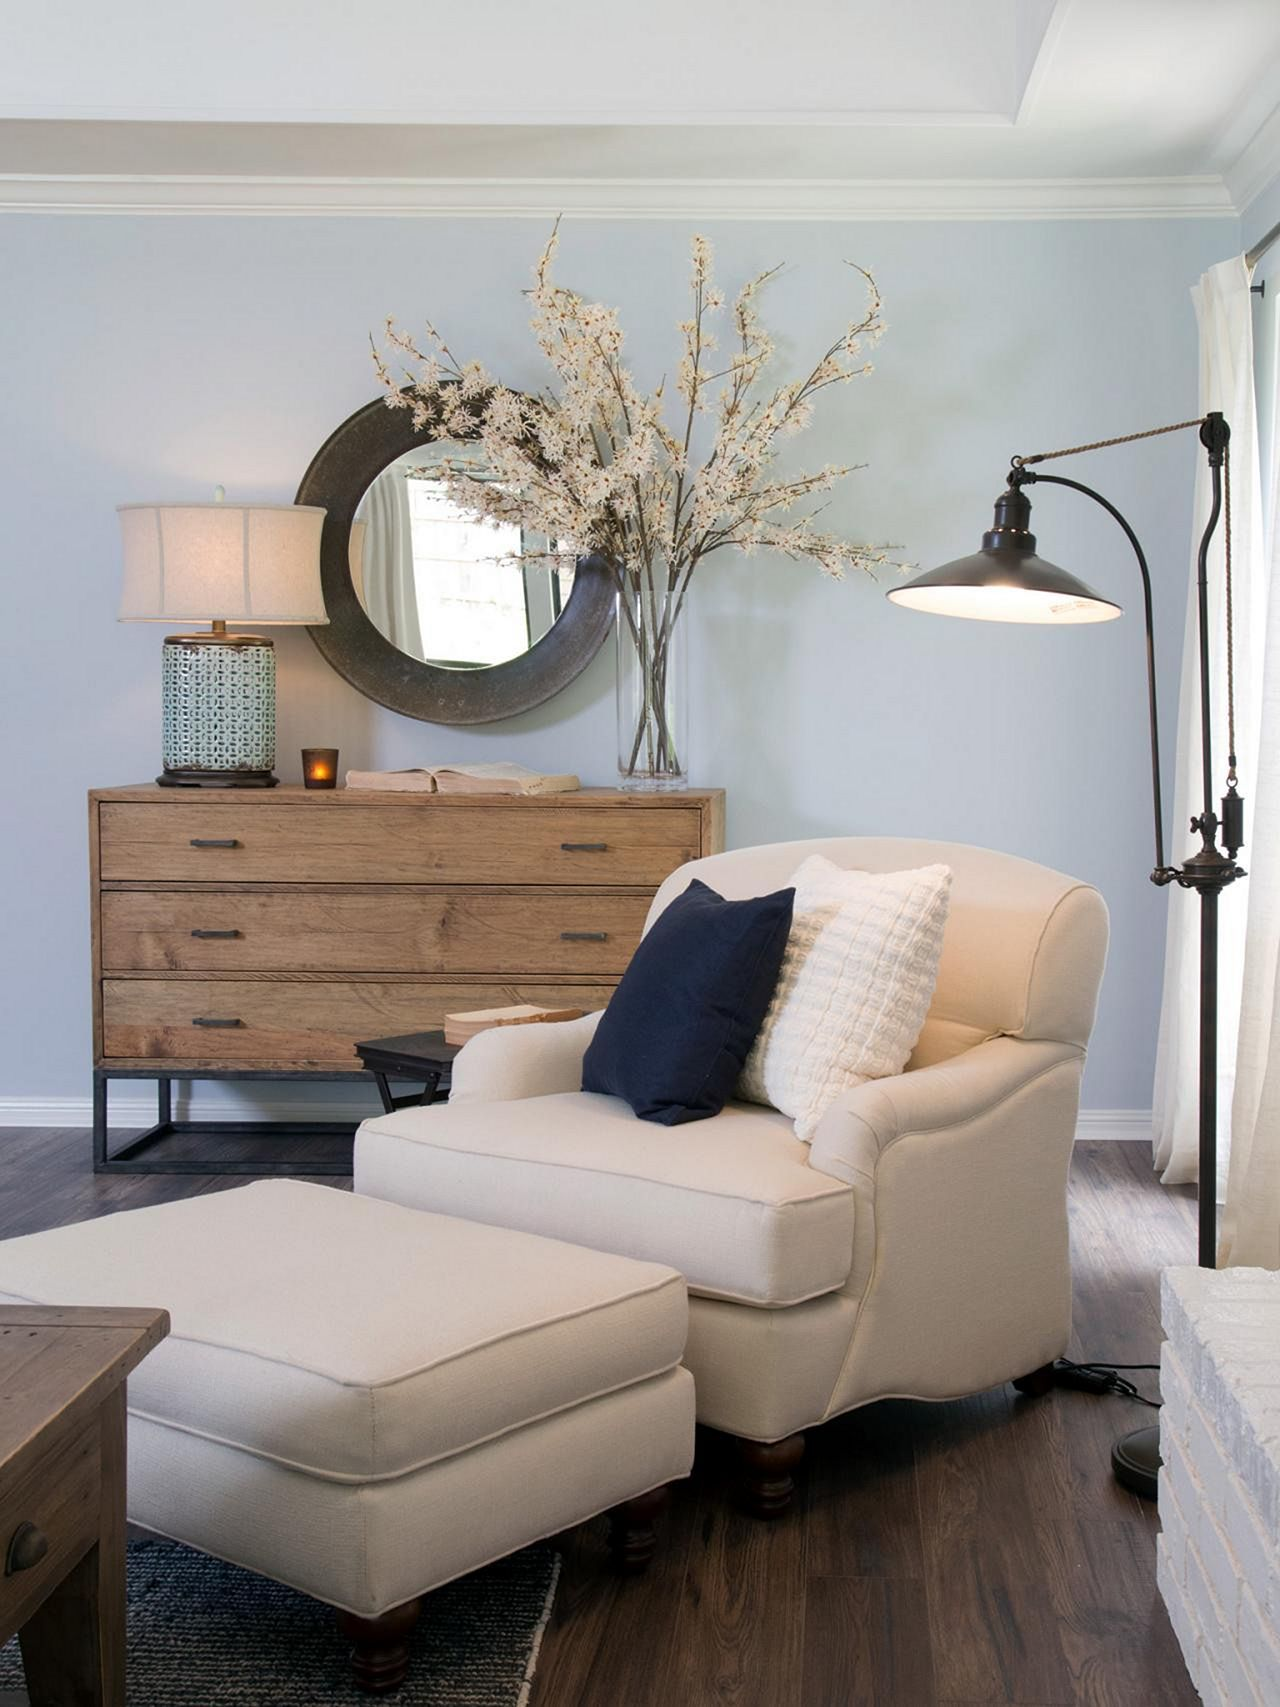 74 Super Cozy Master Sitting Room Ideas Https://www.futuristarchitecture.com